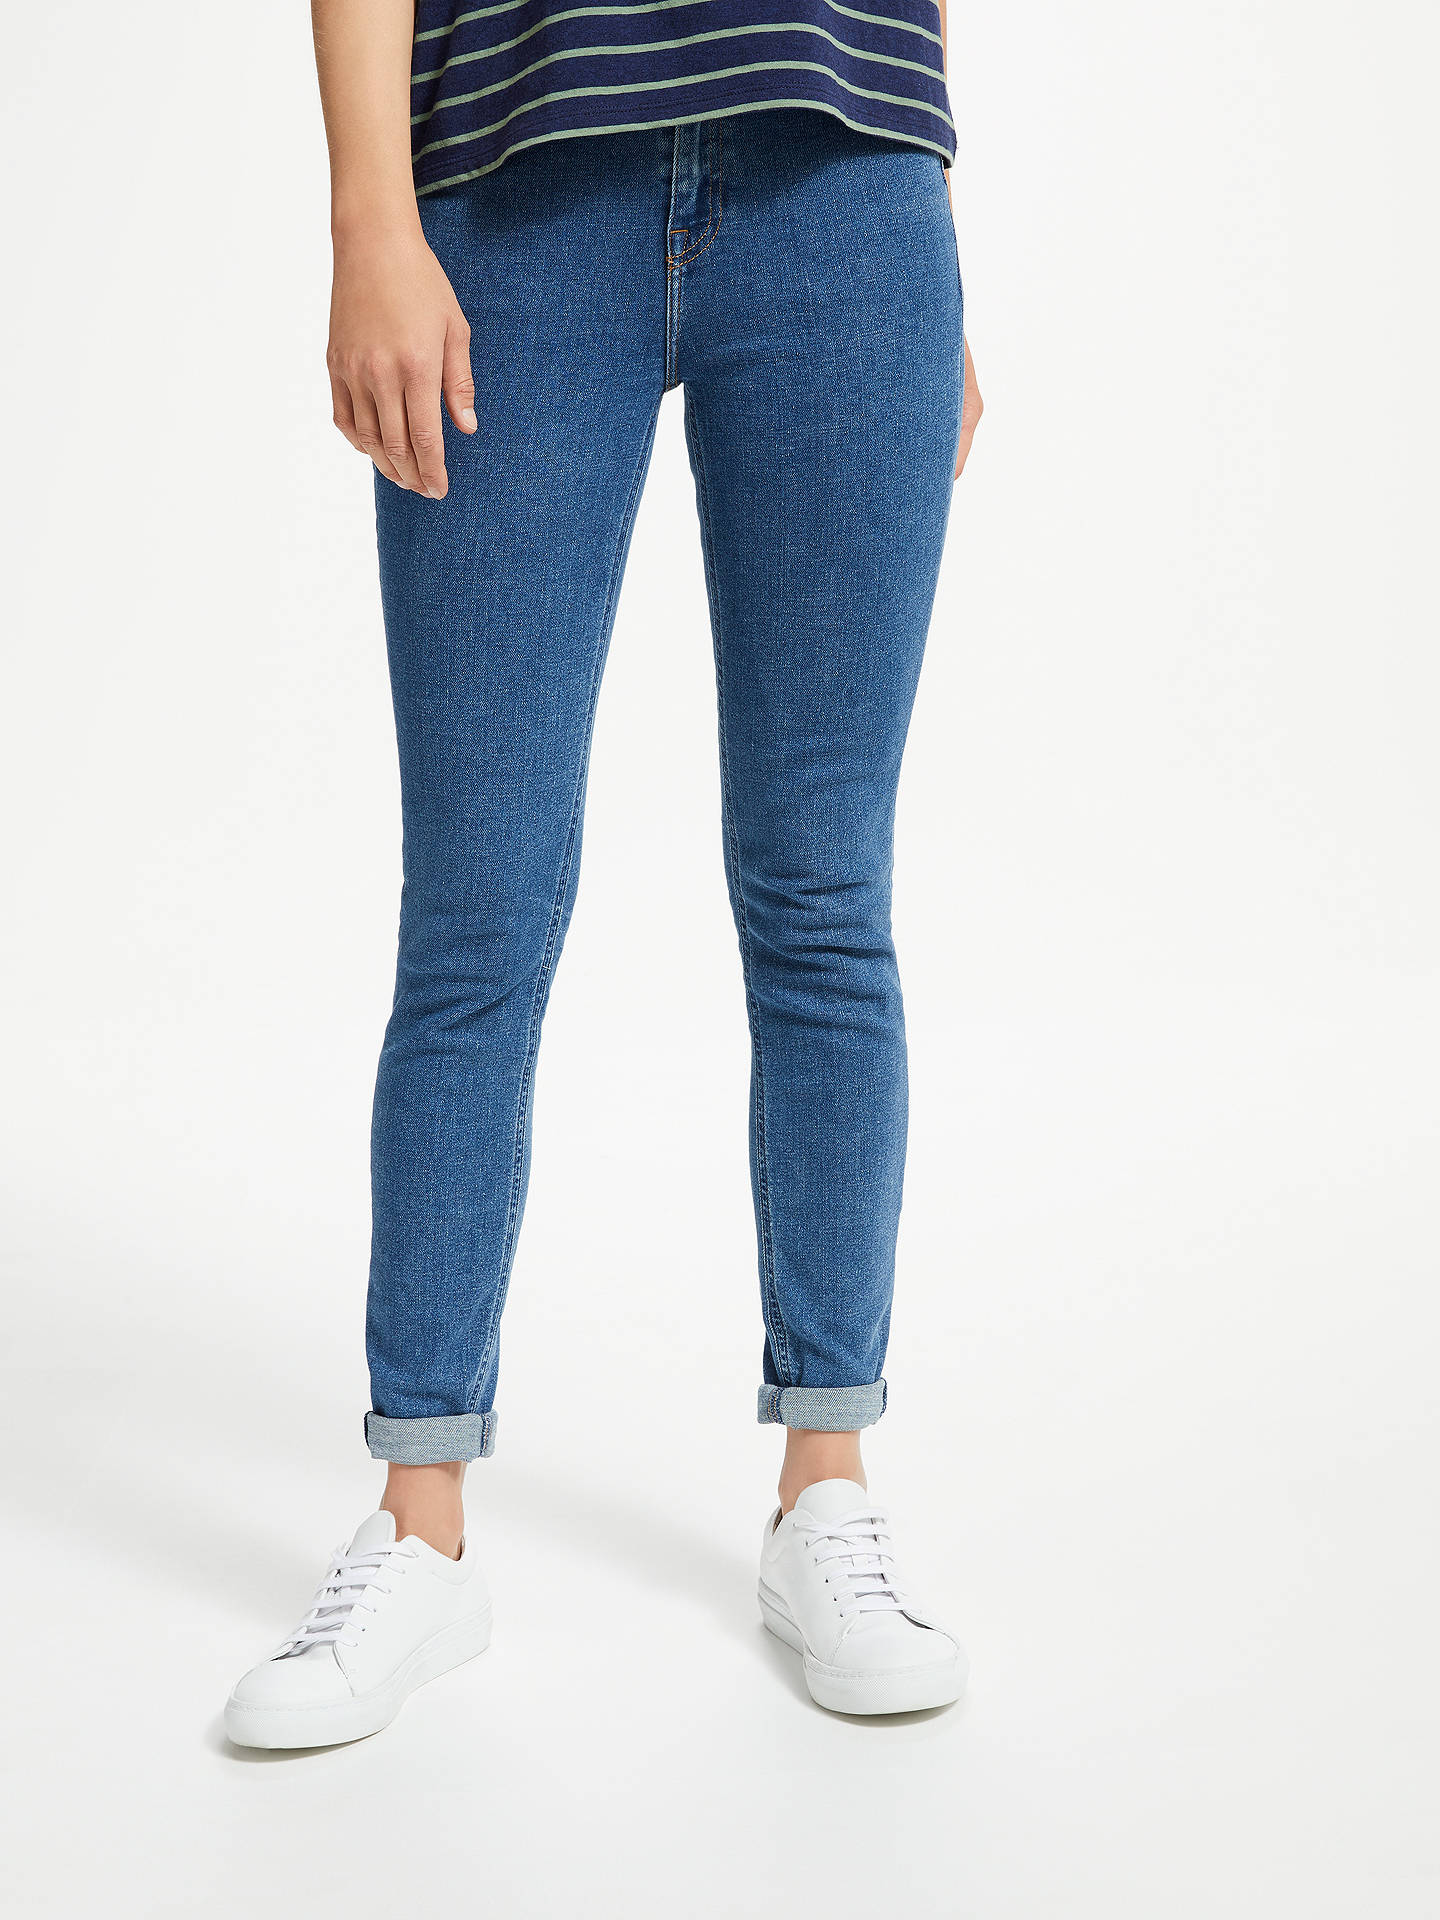 d146ce64 Buy Lee Scarlett High Waist Skinny Jeans, Flat Stone, W27/L31 Online at ...